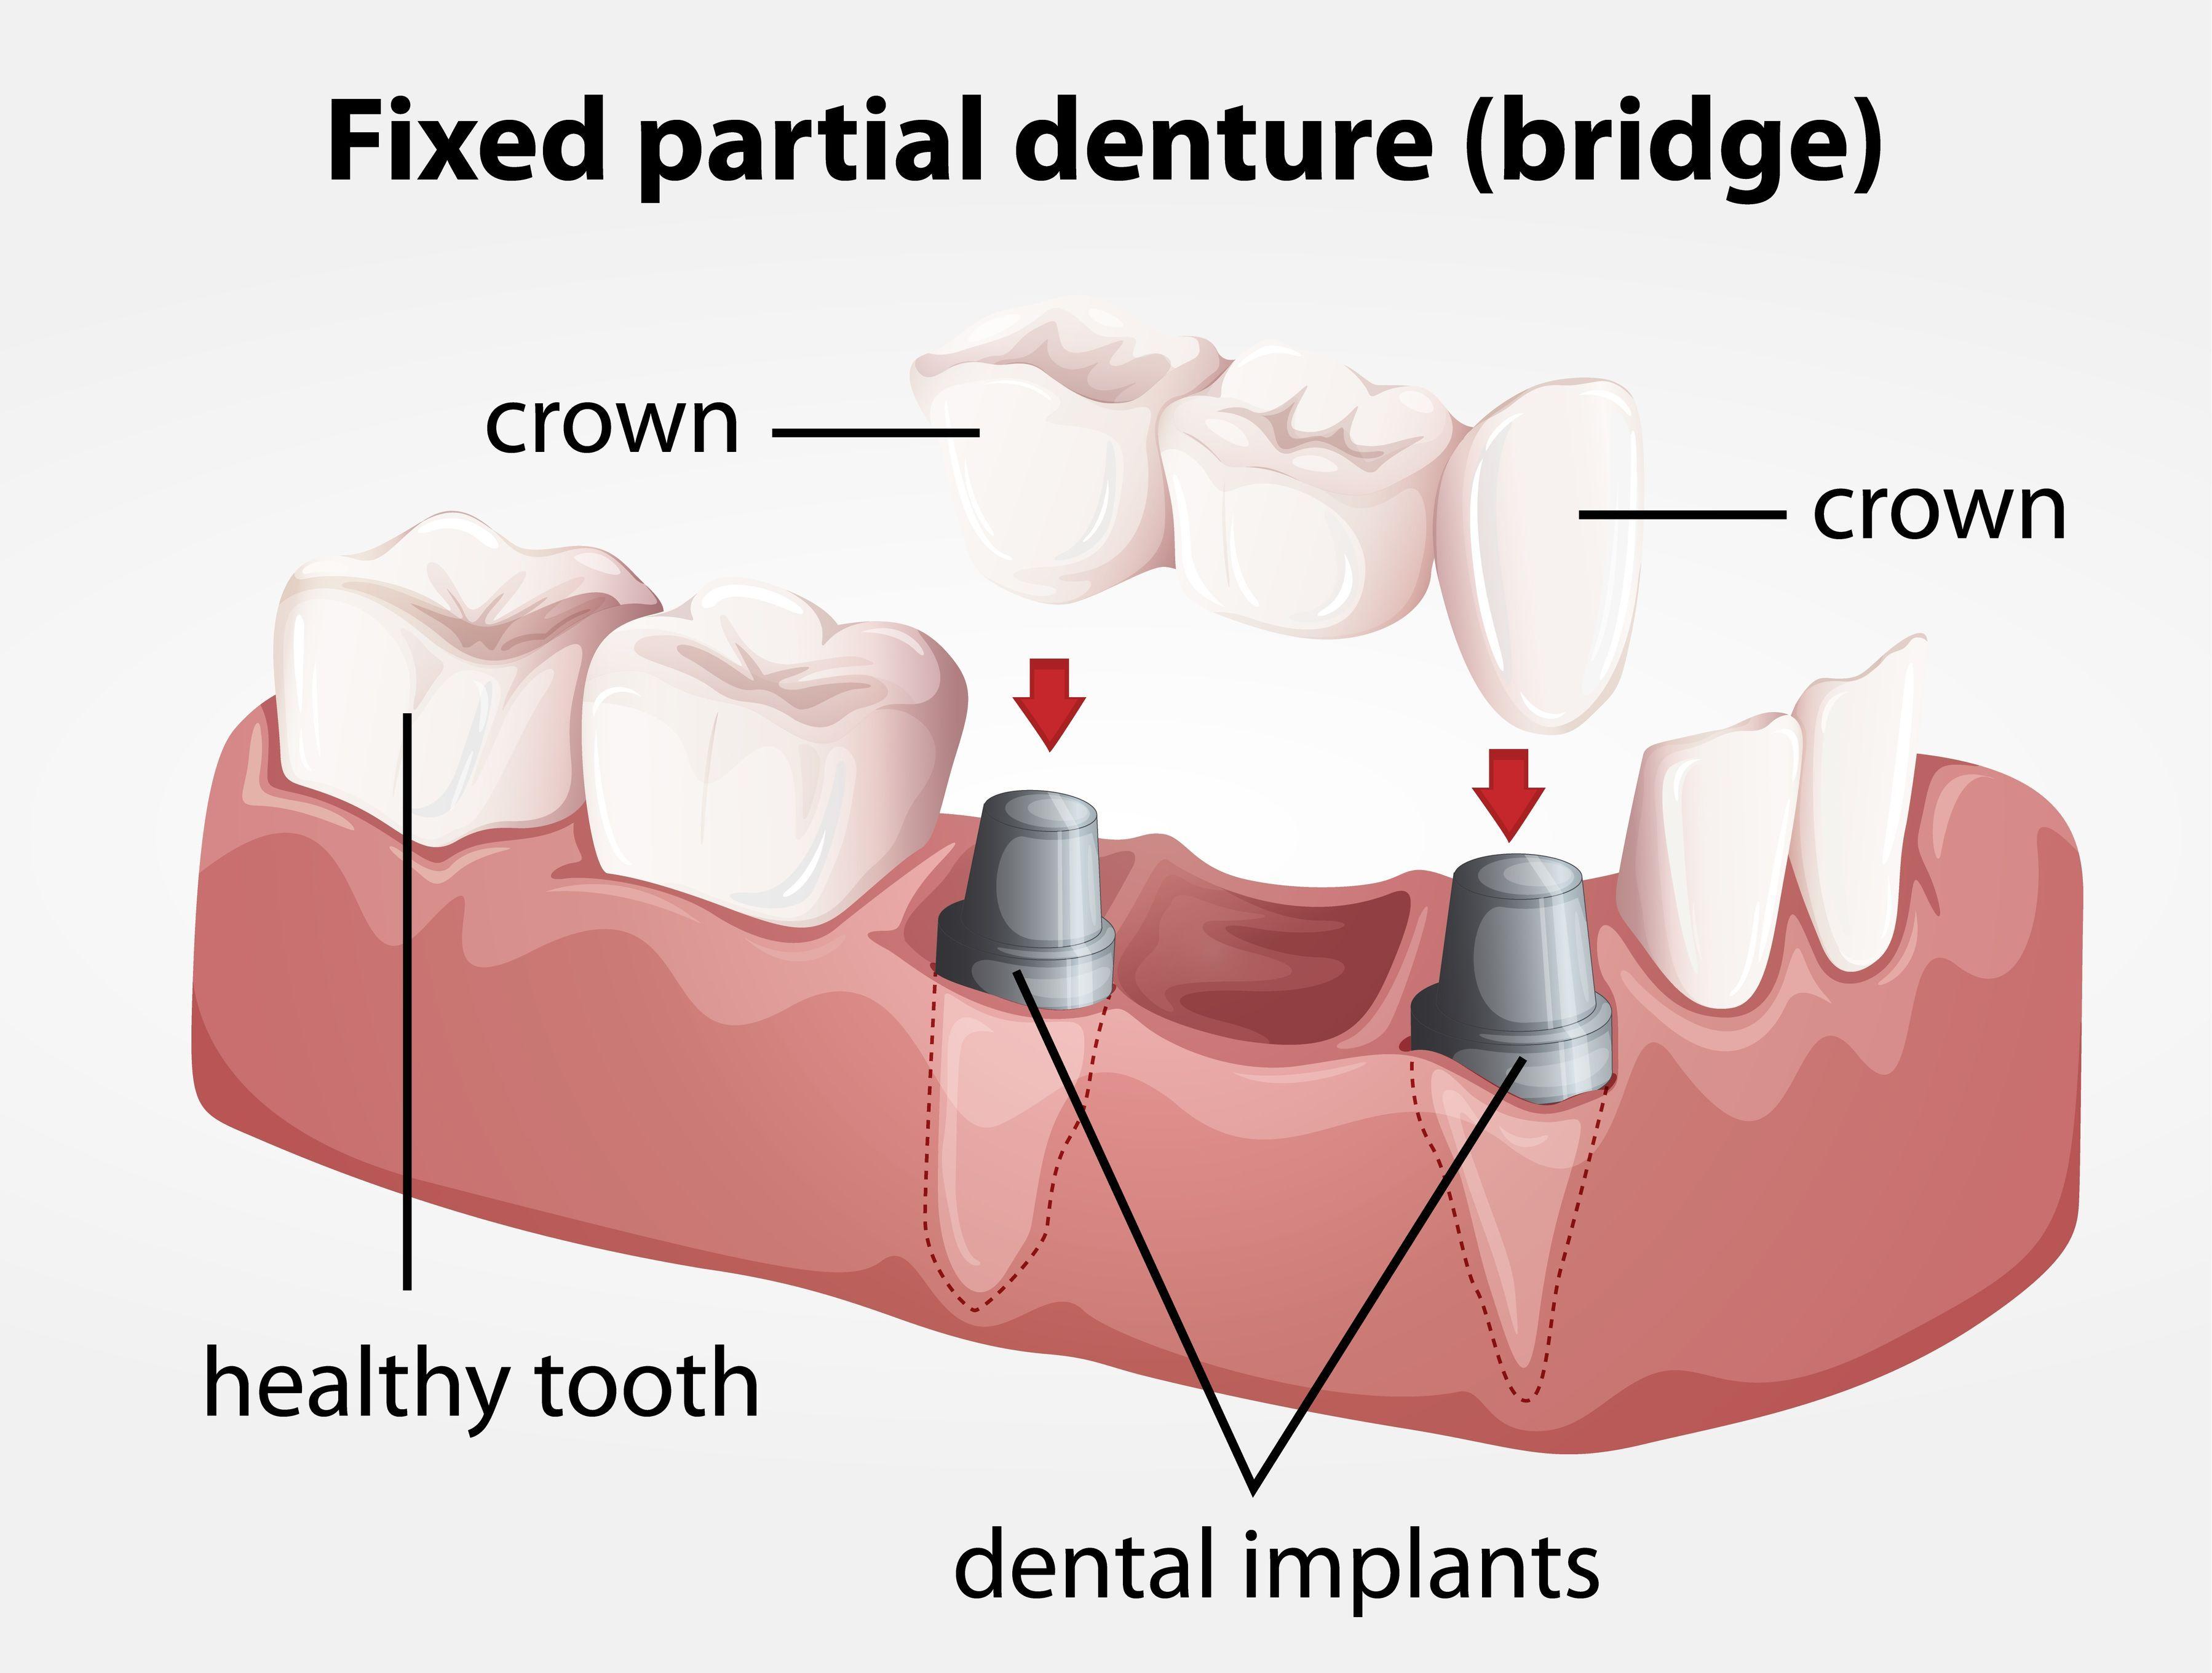 ip walmart com affordable smile ne lincoln veneers perfect dentures